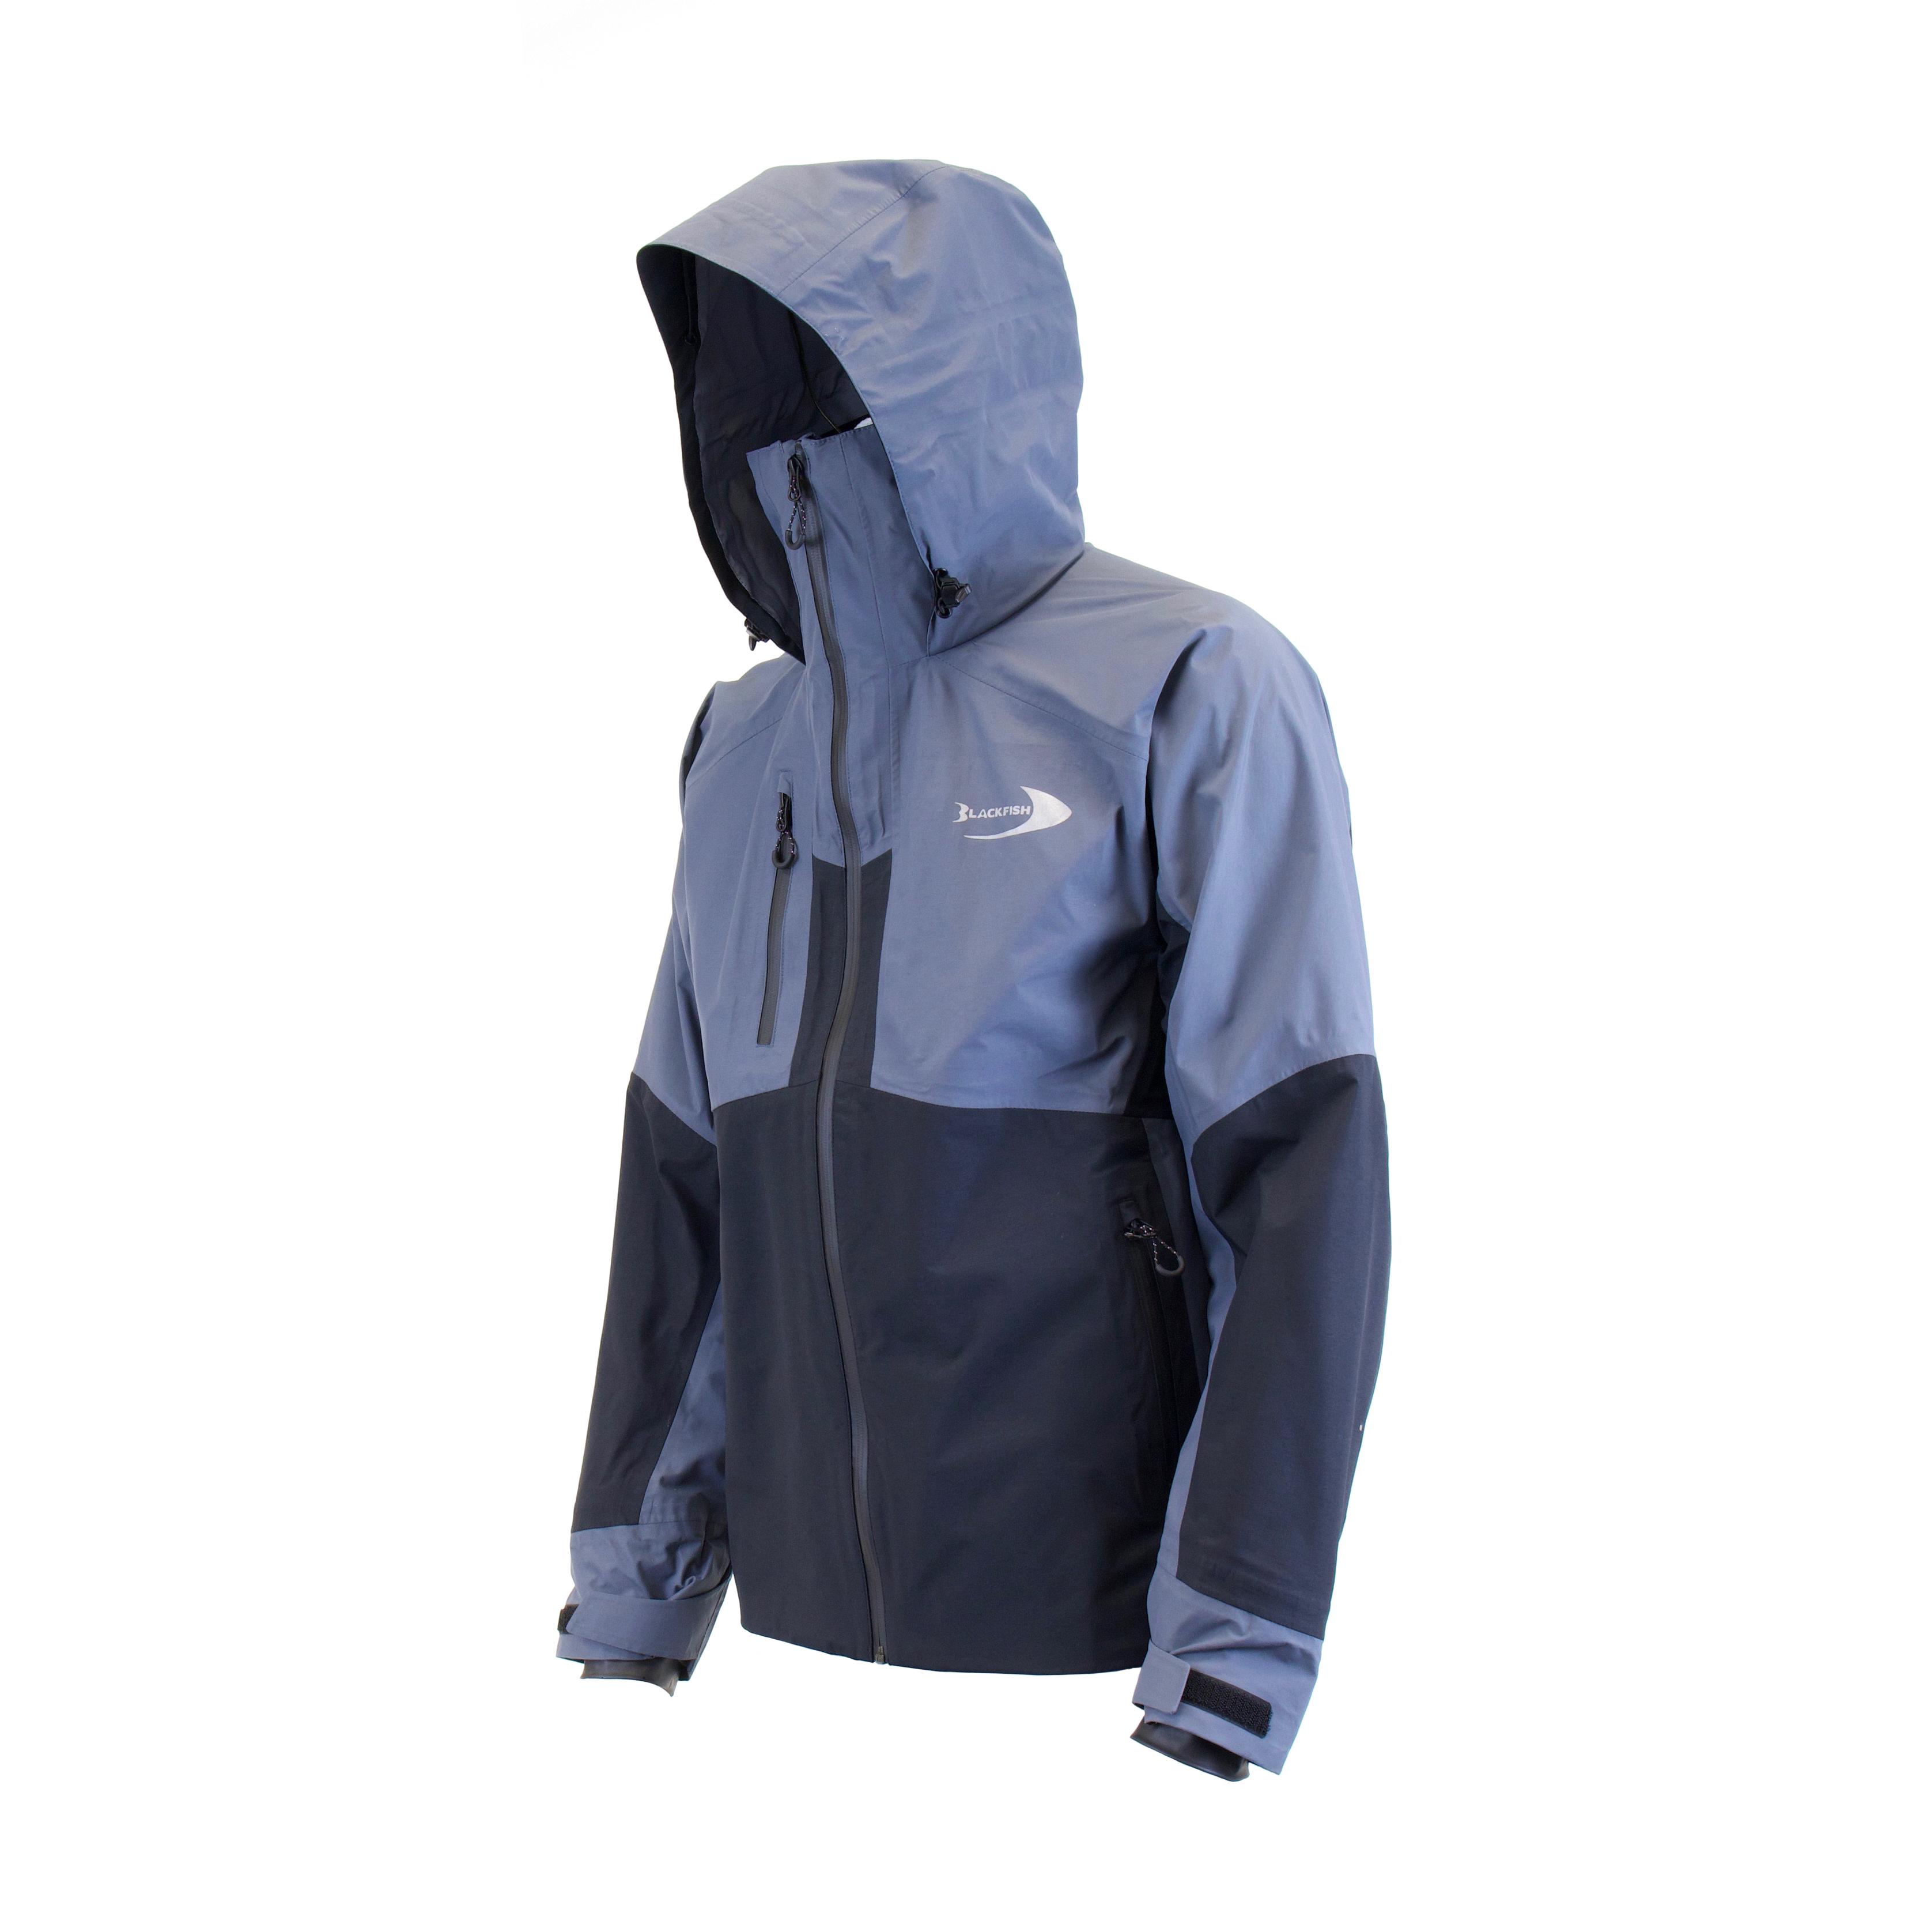 5a1f610952a Mototech Hurricane Rain Jacket